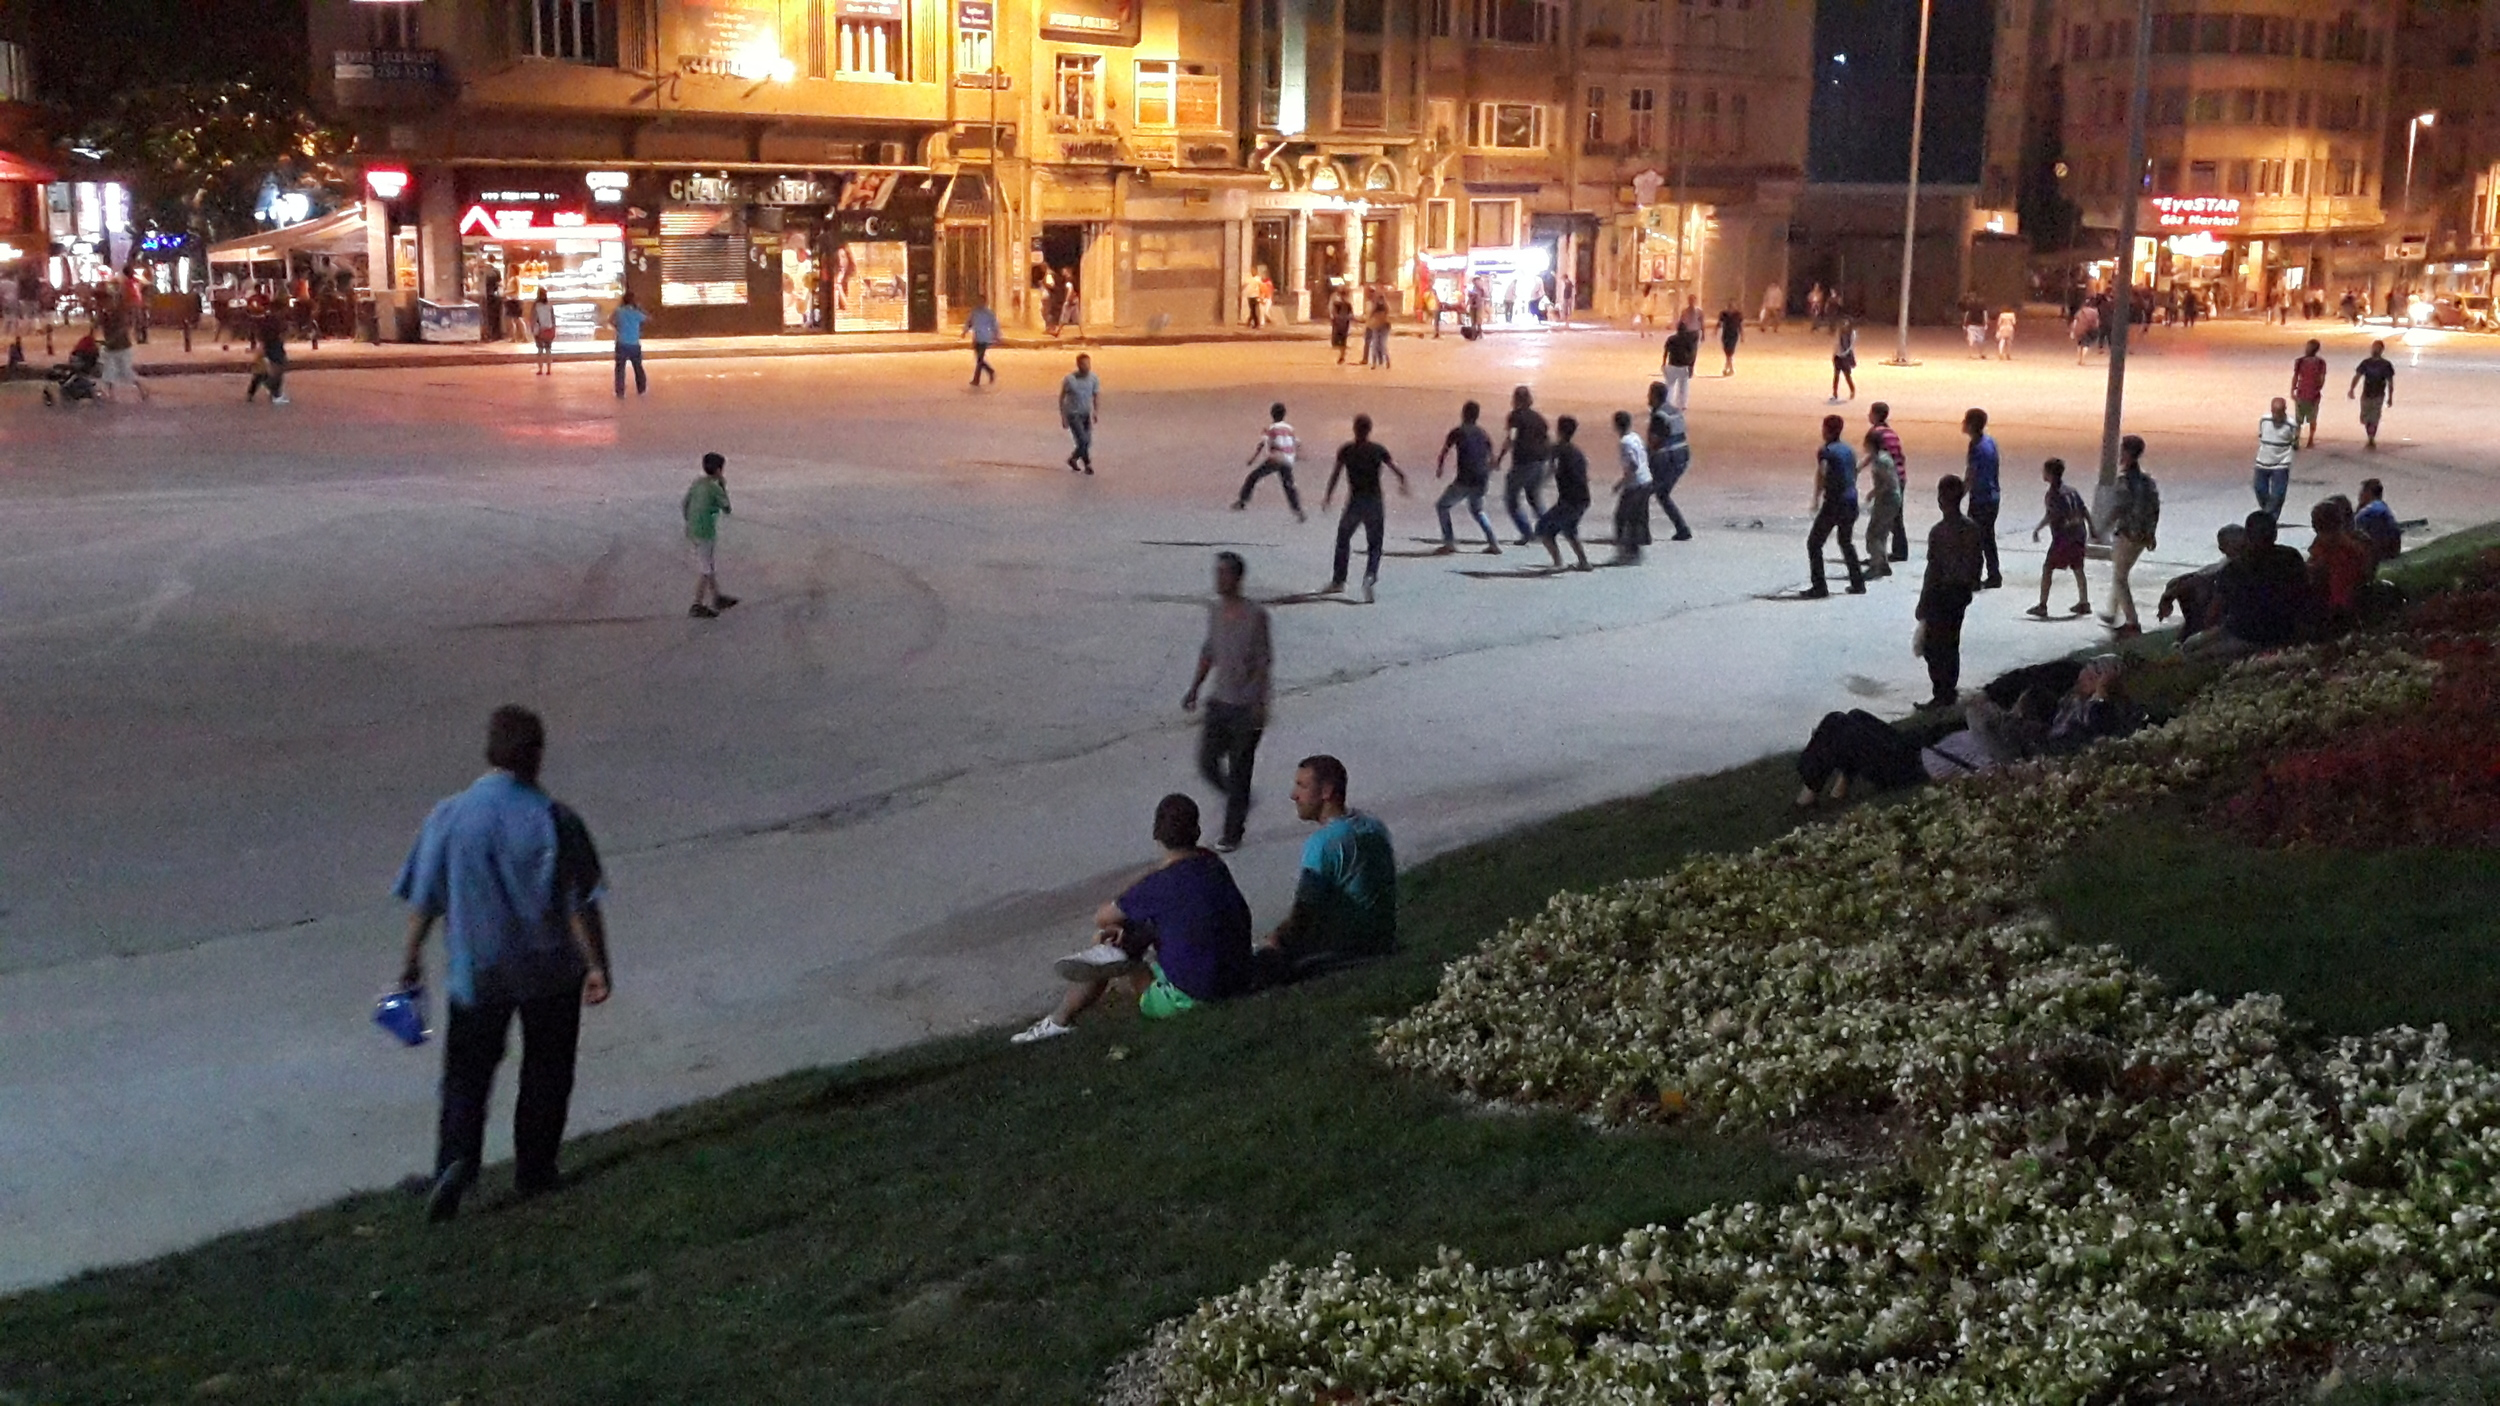 Night life in Gezi Park